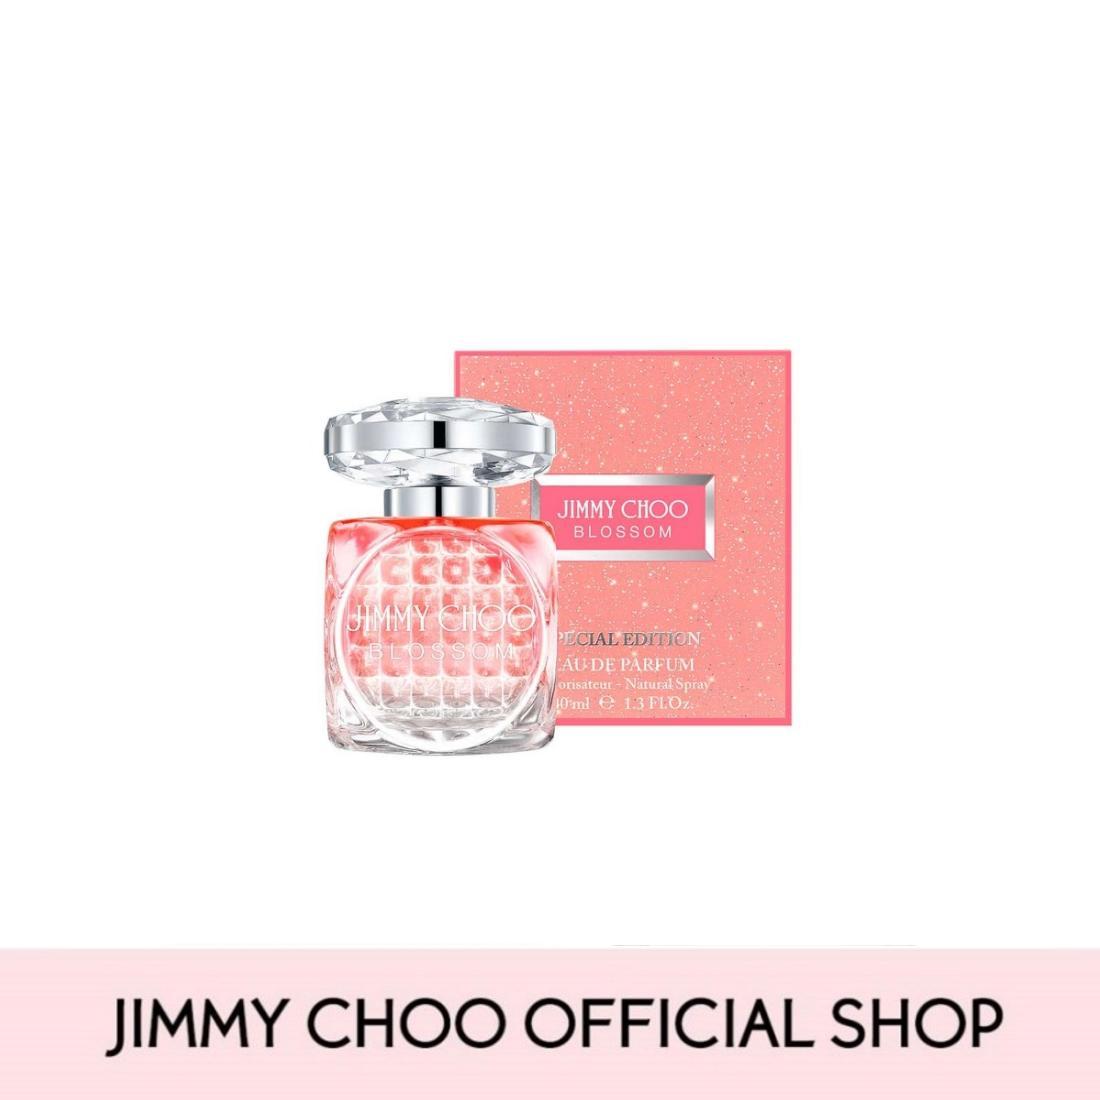 Jimmy Choo Blossom Limited Edition EDP 40ml